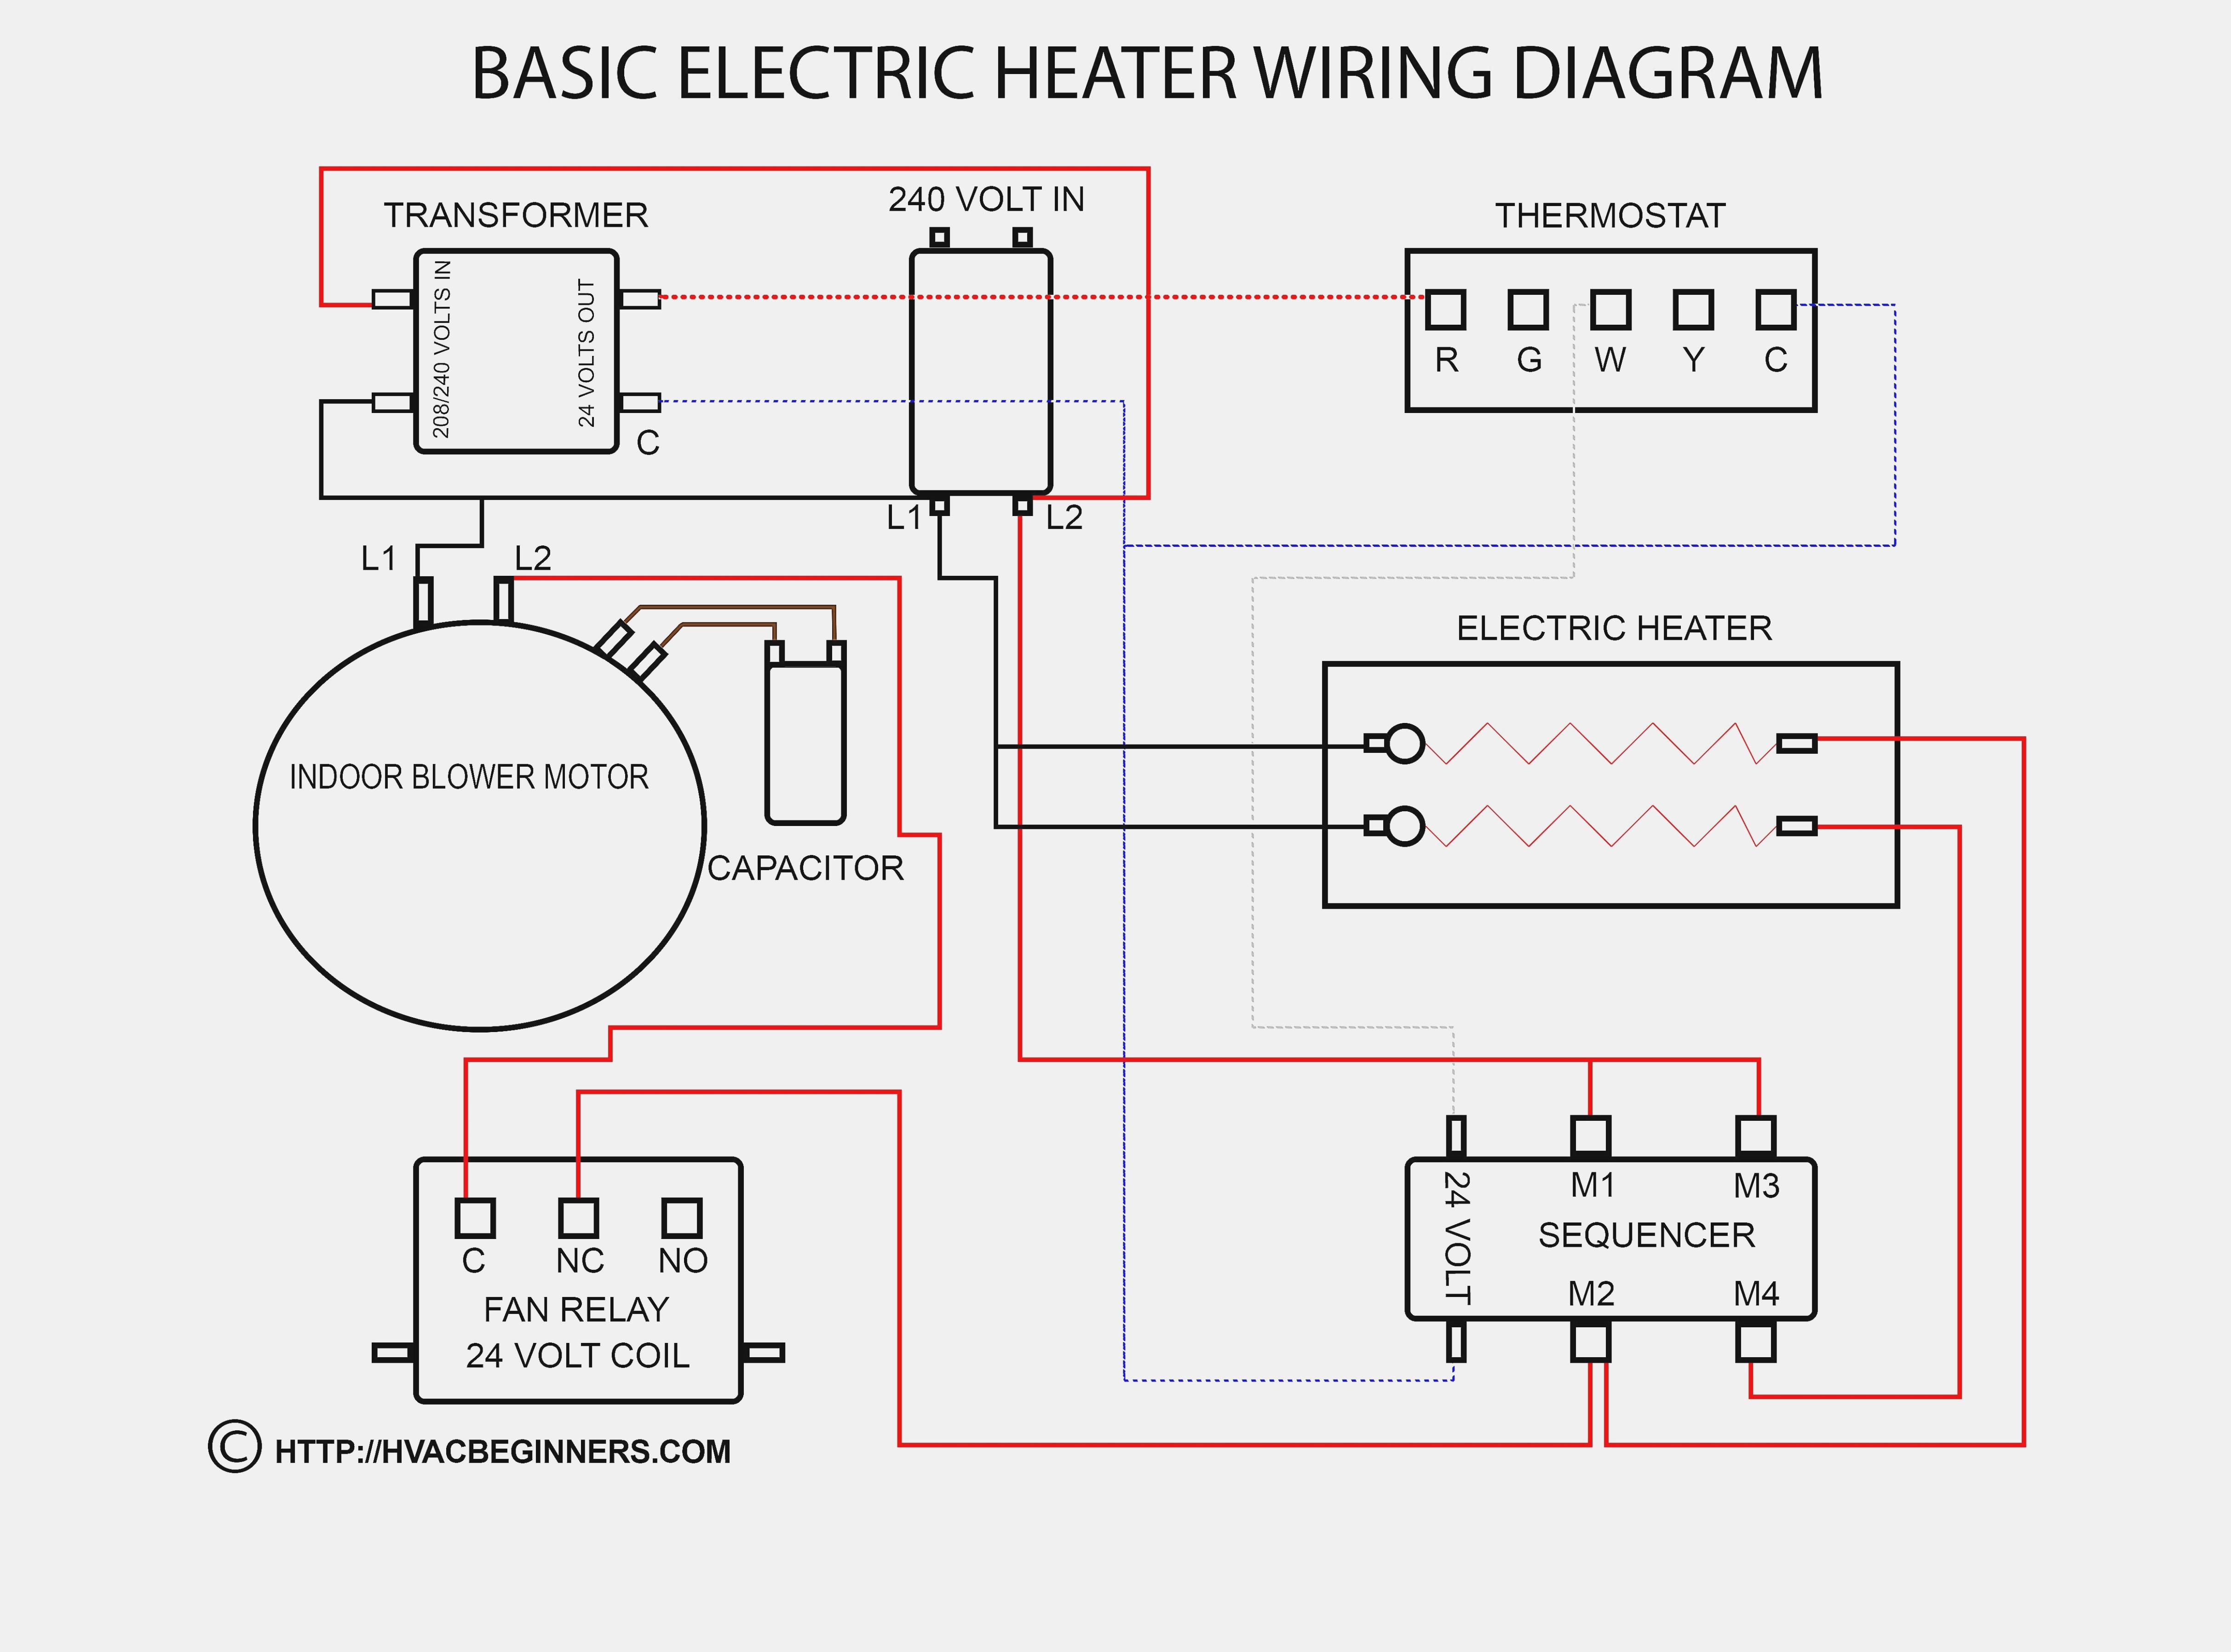 Heater Wiring Diagram - Data Wiring Diagram Schematic - Water Heater Wiring Diagram